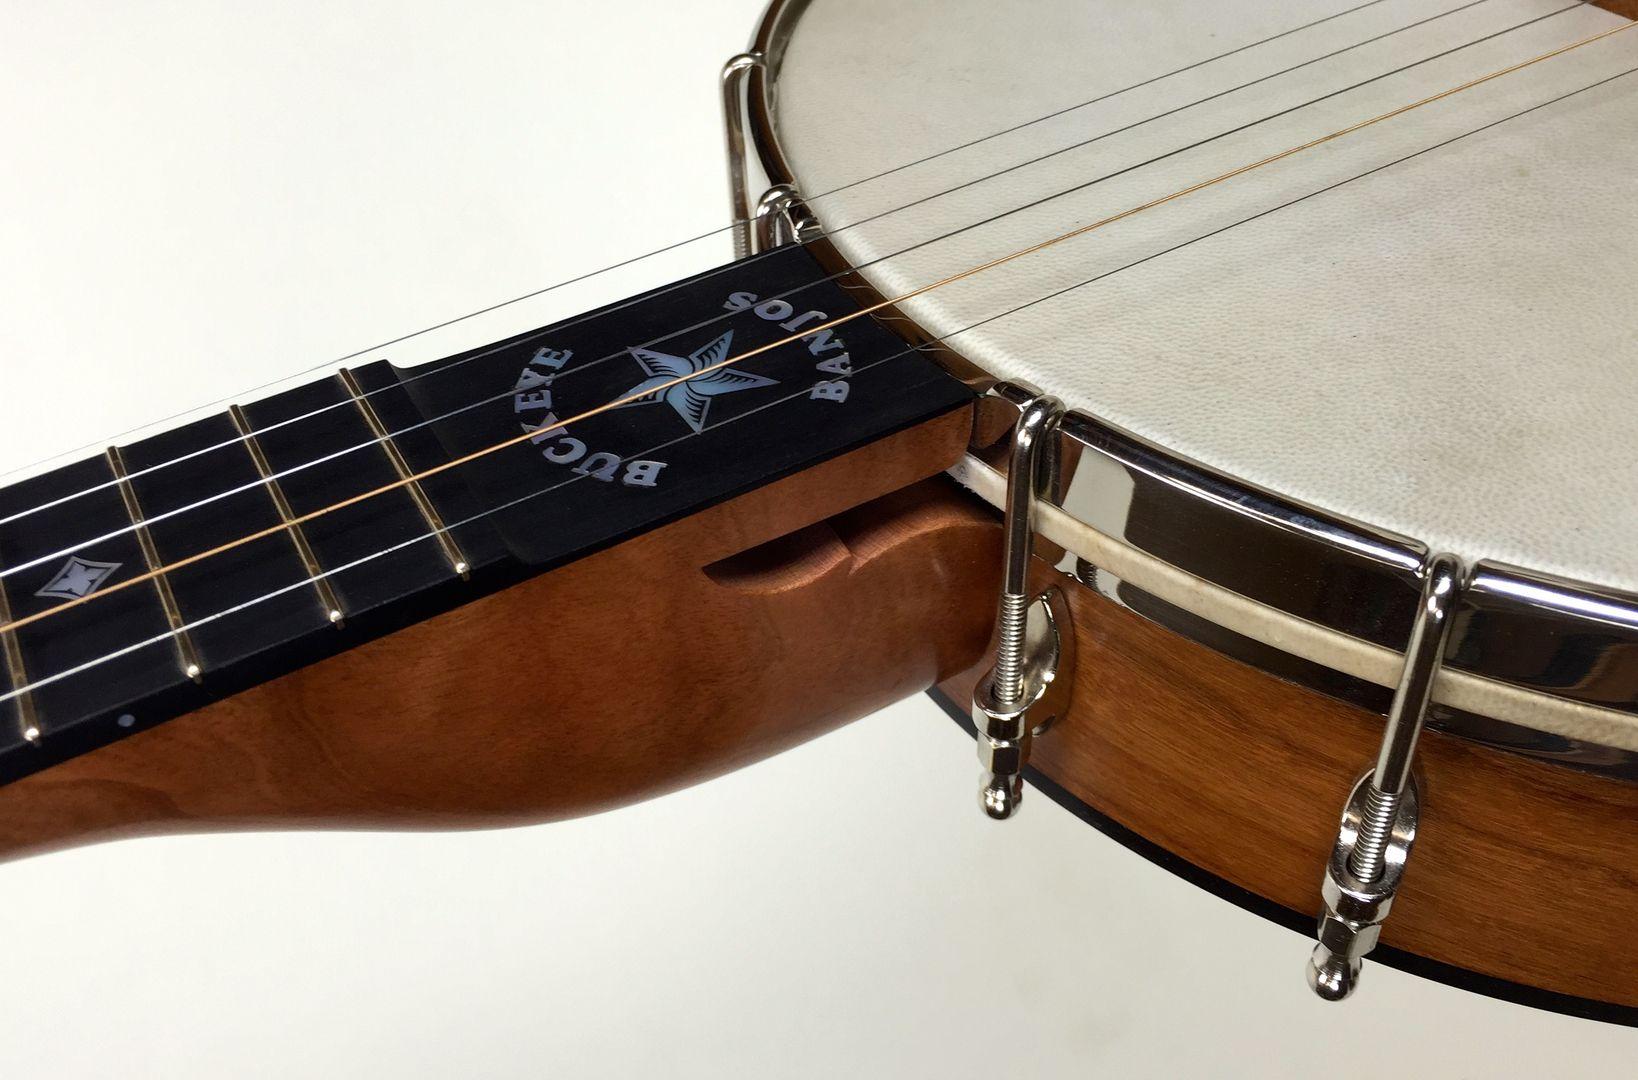 Latest Banjos for Buckeye Banjos. Custom openback banjos